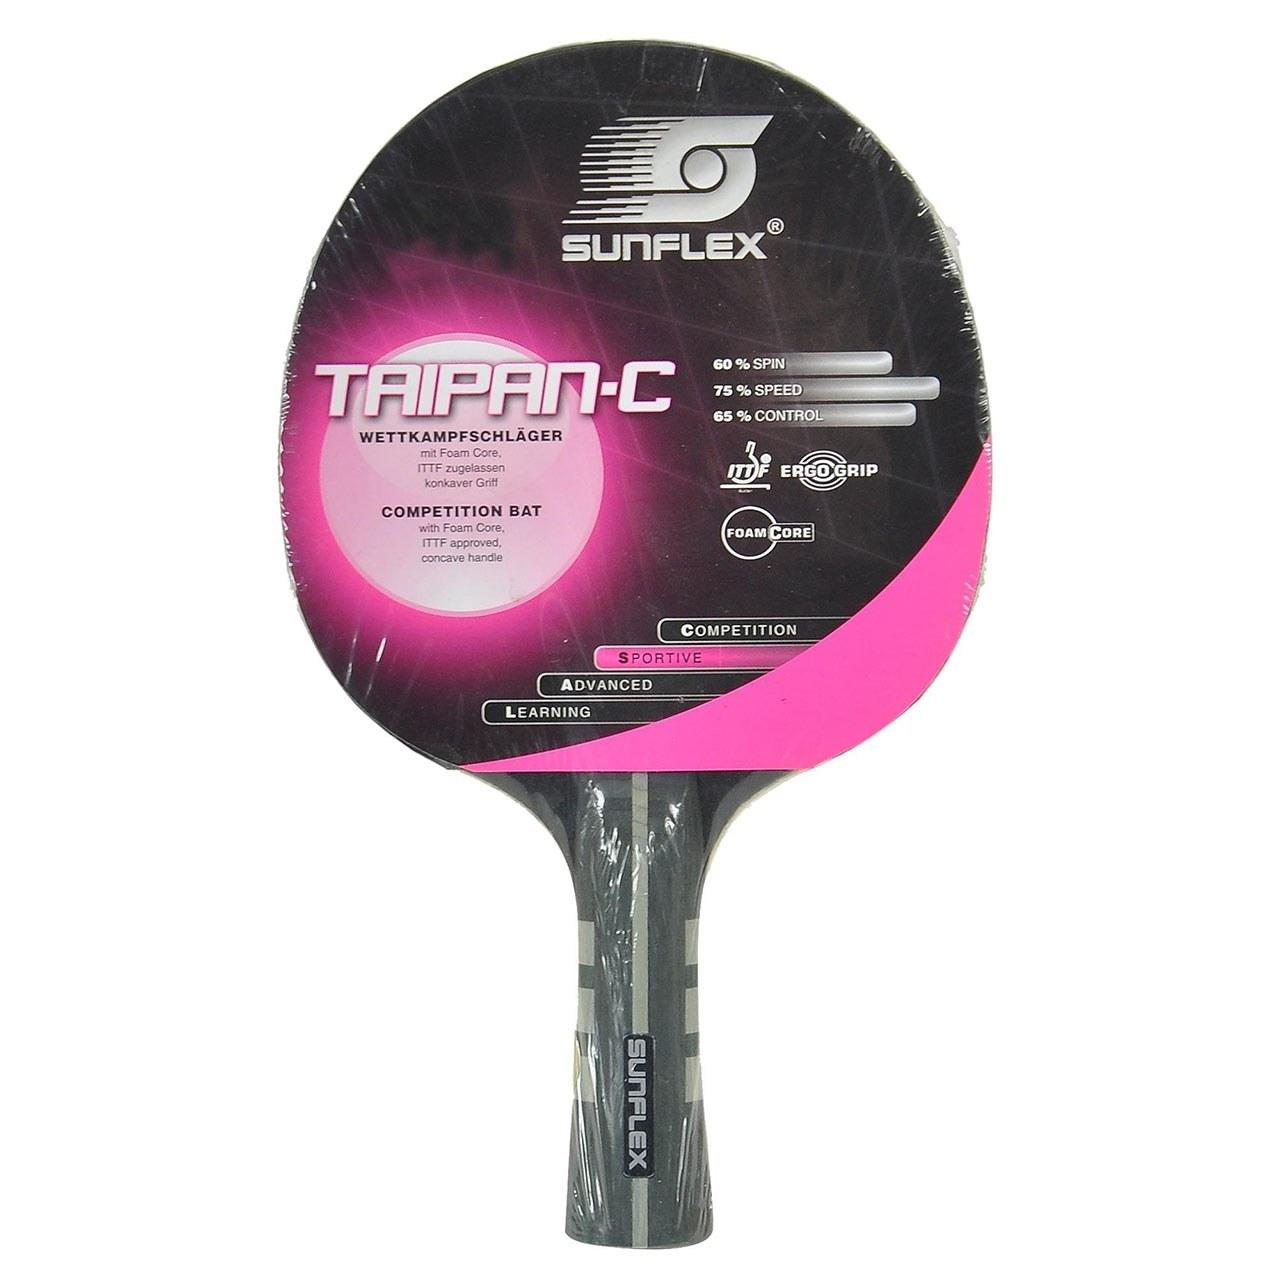 راکت پينگ پنگ سان فلکس مدل TAIPAN-C Level 600 | Sunflex TAIPAN-C Level 600 Ping Pong Racket